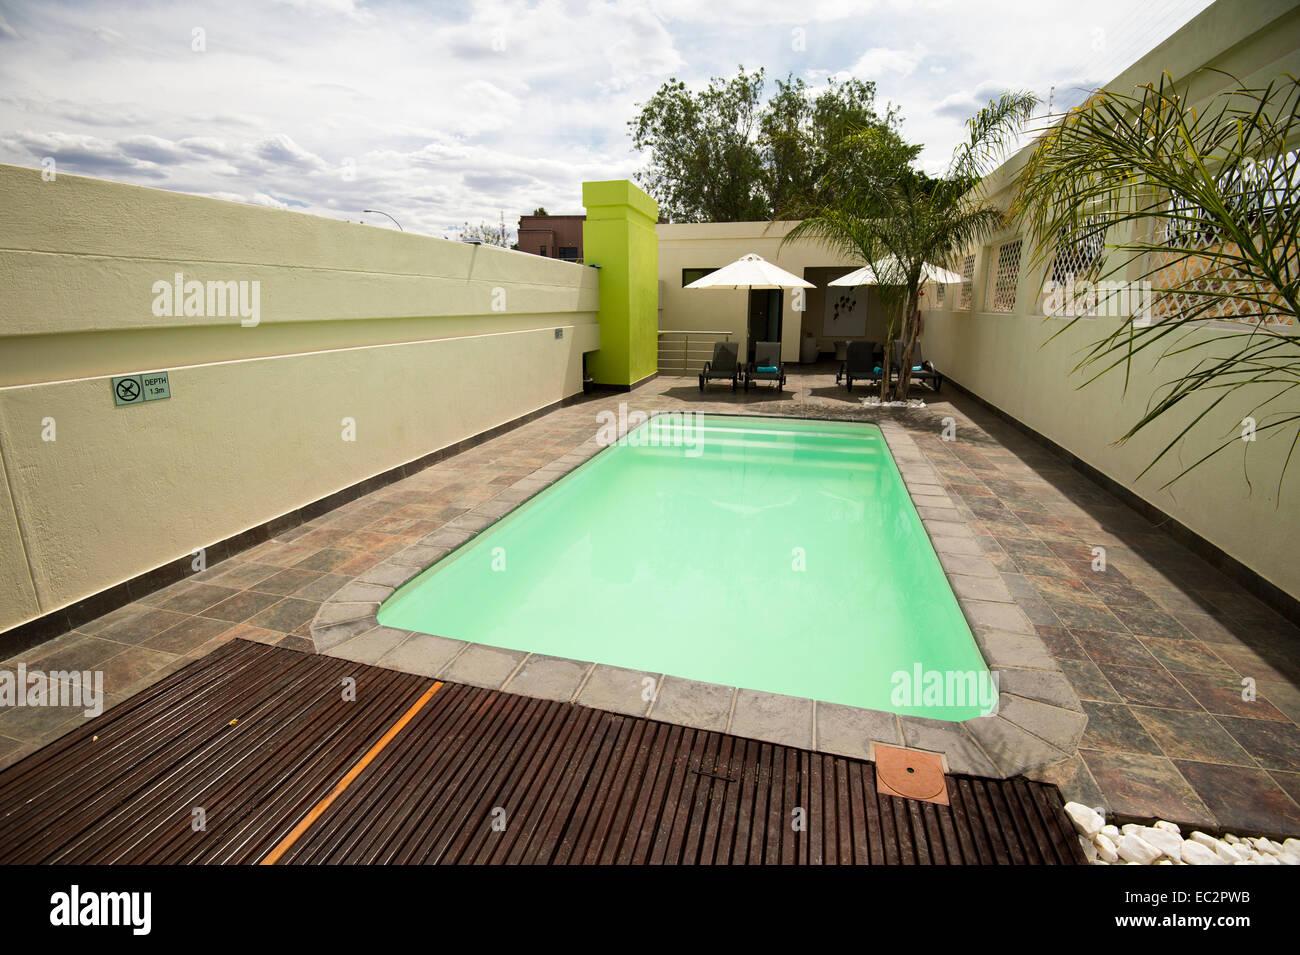 Namibia, Winhoek. Galton House Guest Lodging. Relaxing pool. - Stock Image